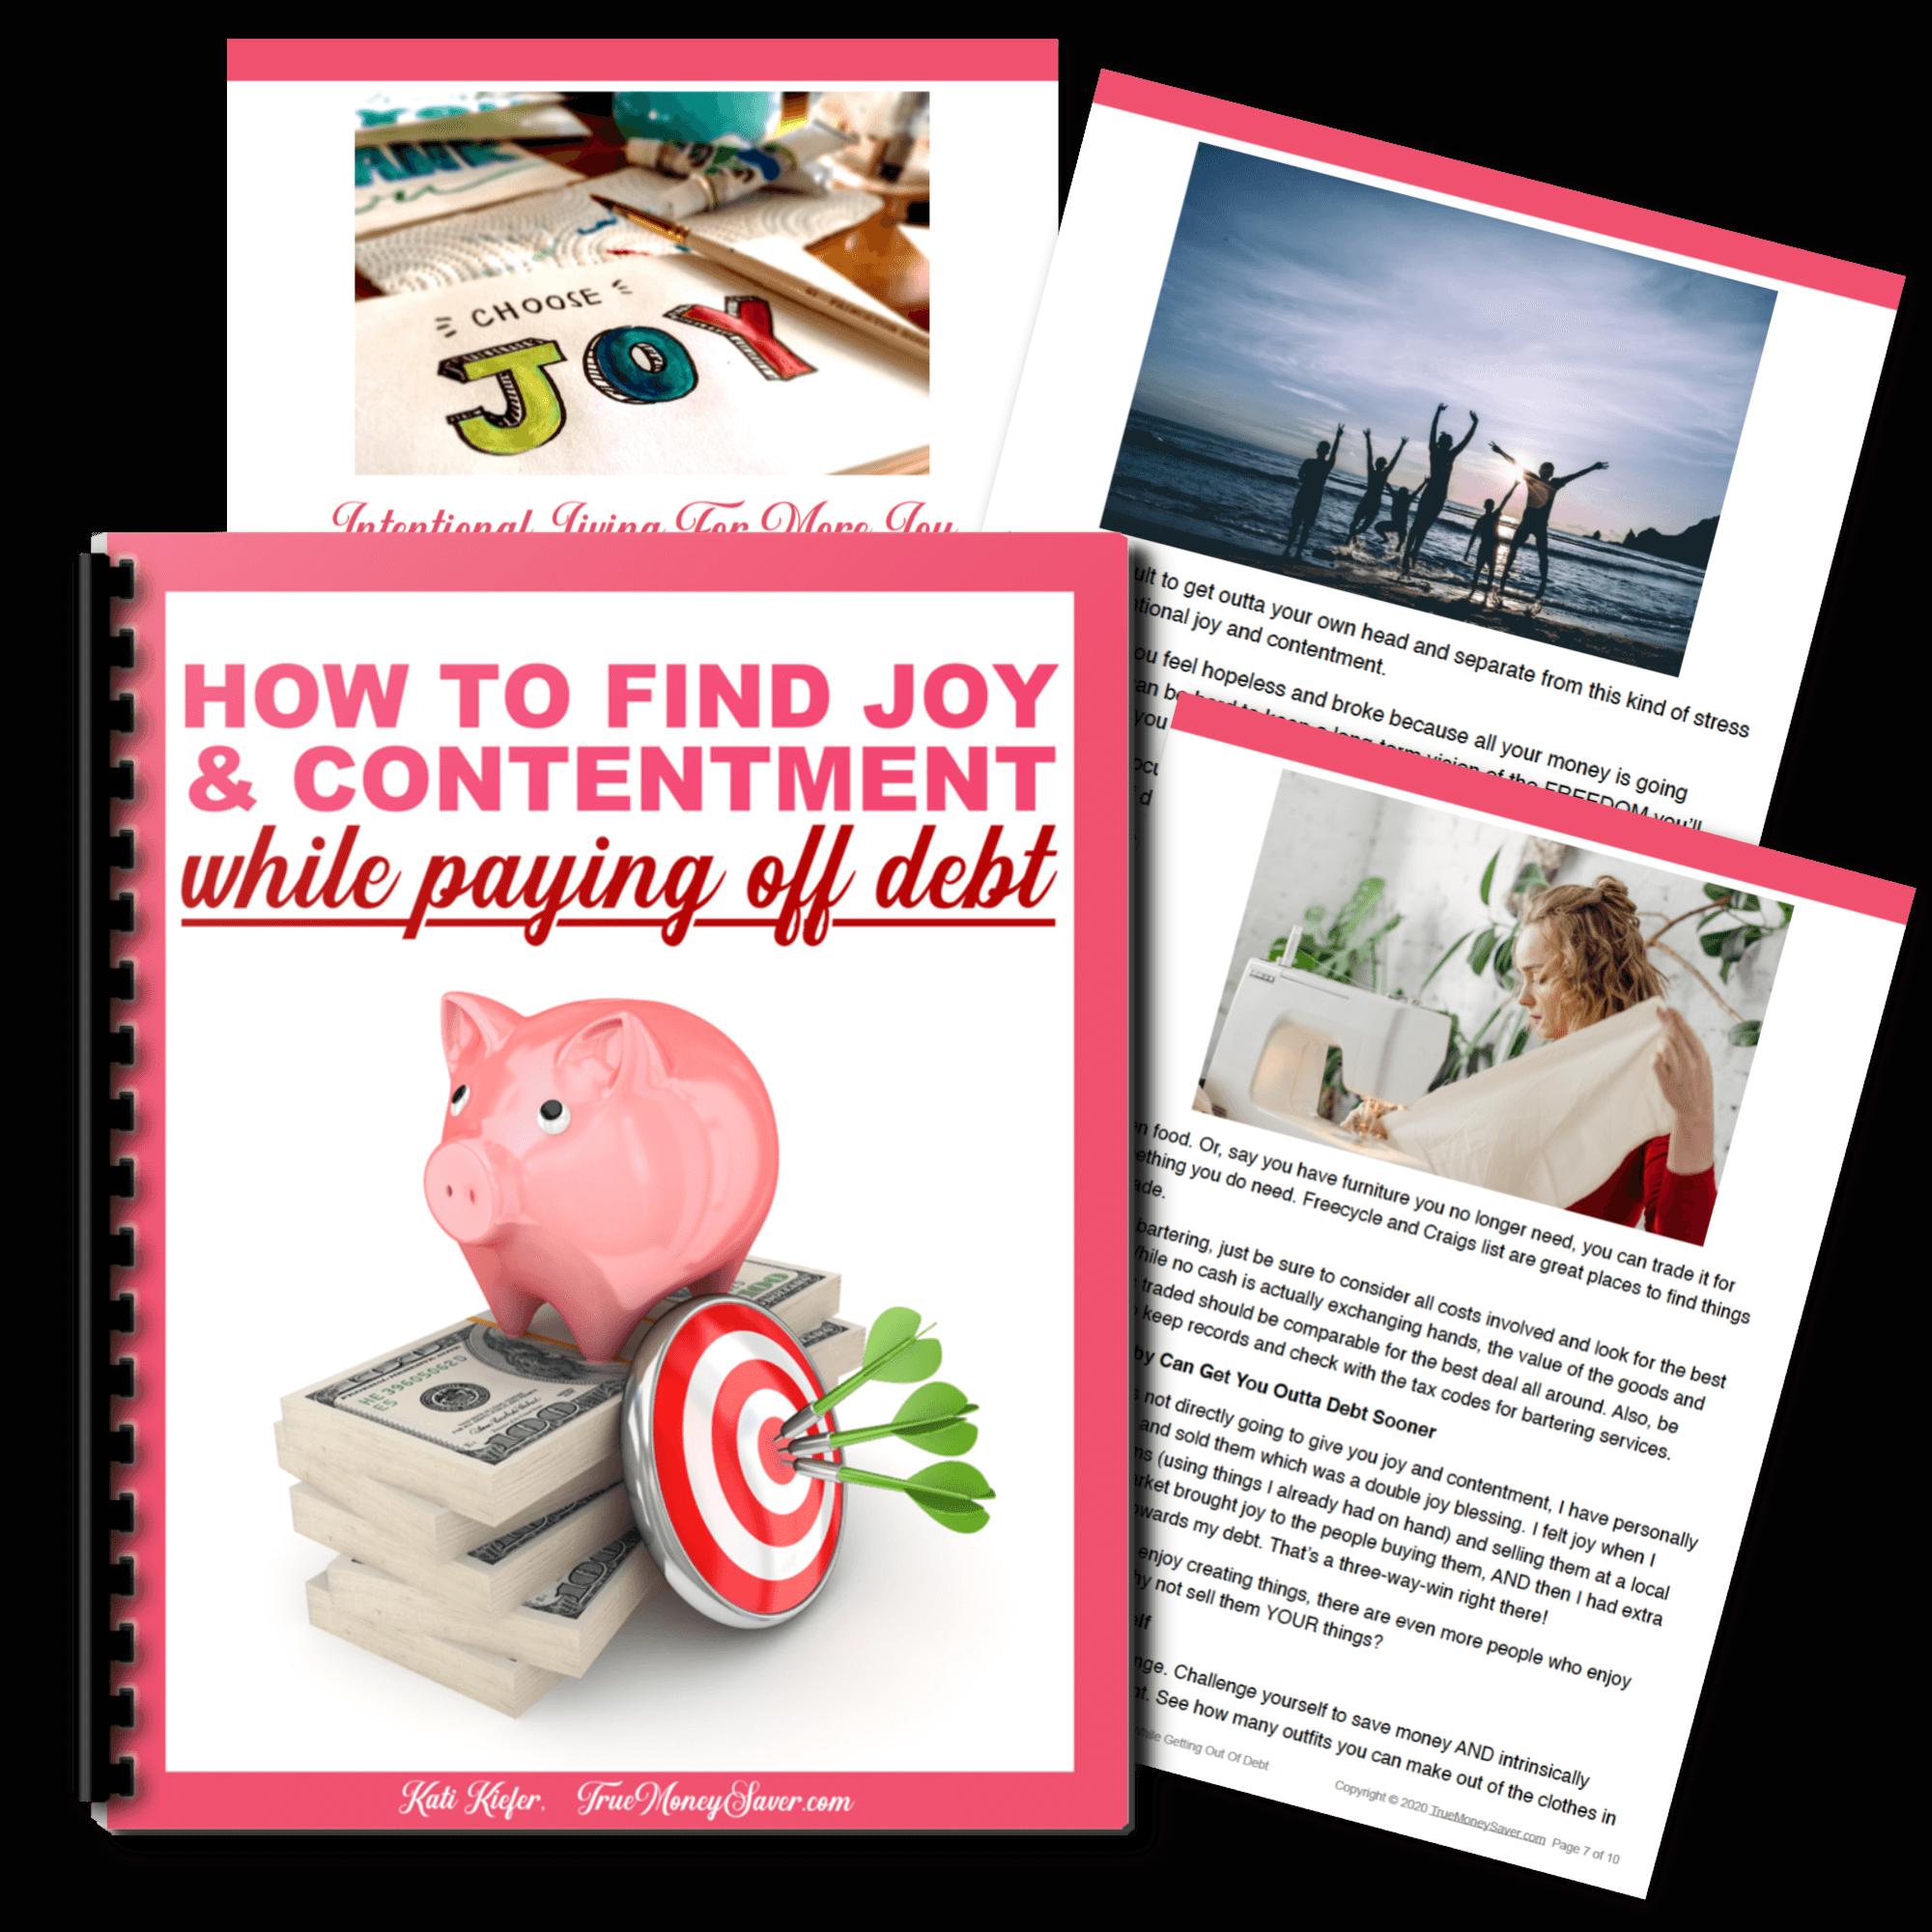 When Do We Get Our Publix Christmas Bonus 2020 Couponing At Publix   Insider Secrets That'll Save You More Money